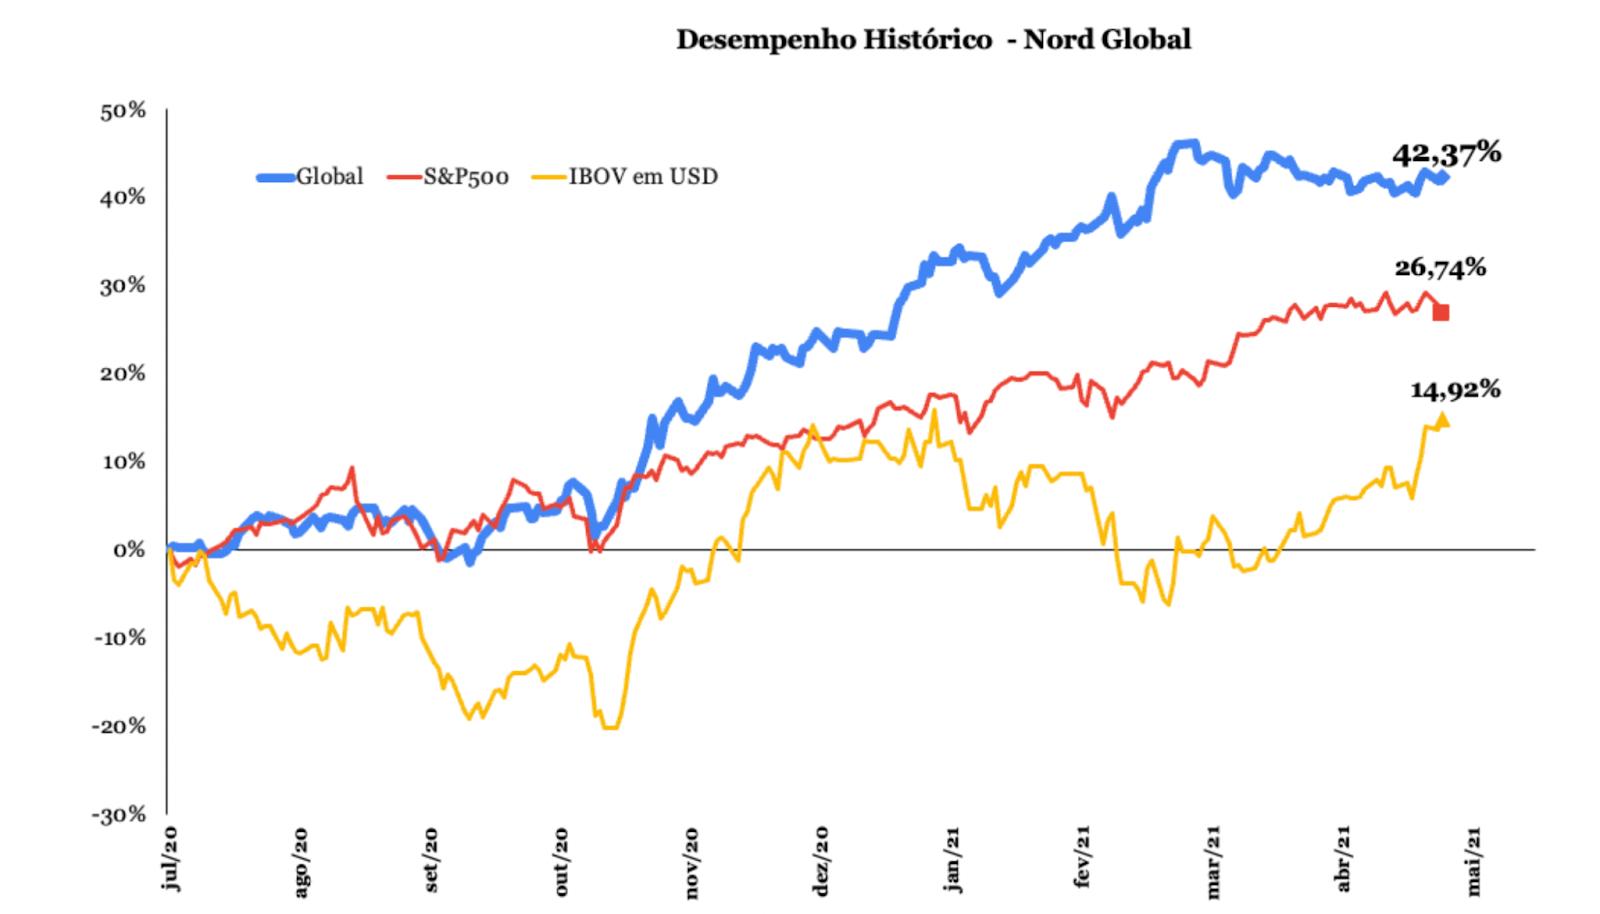 Gráfico apresenta desempenho do Nord Global.